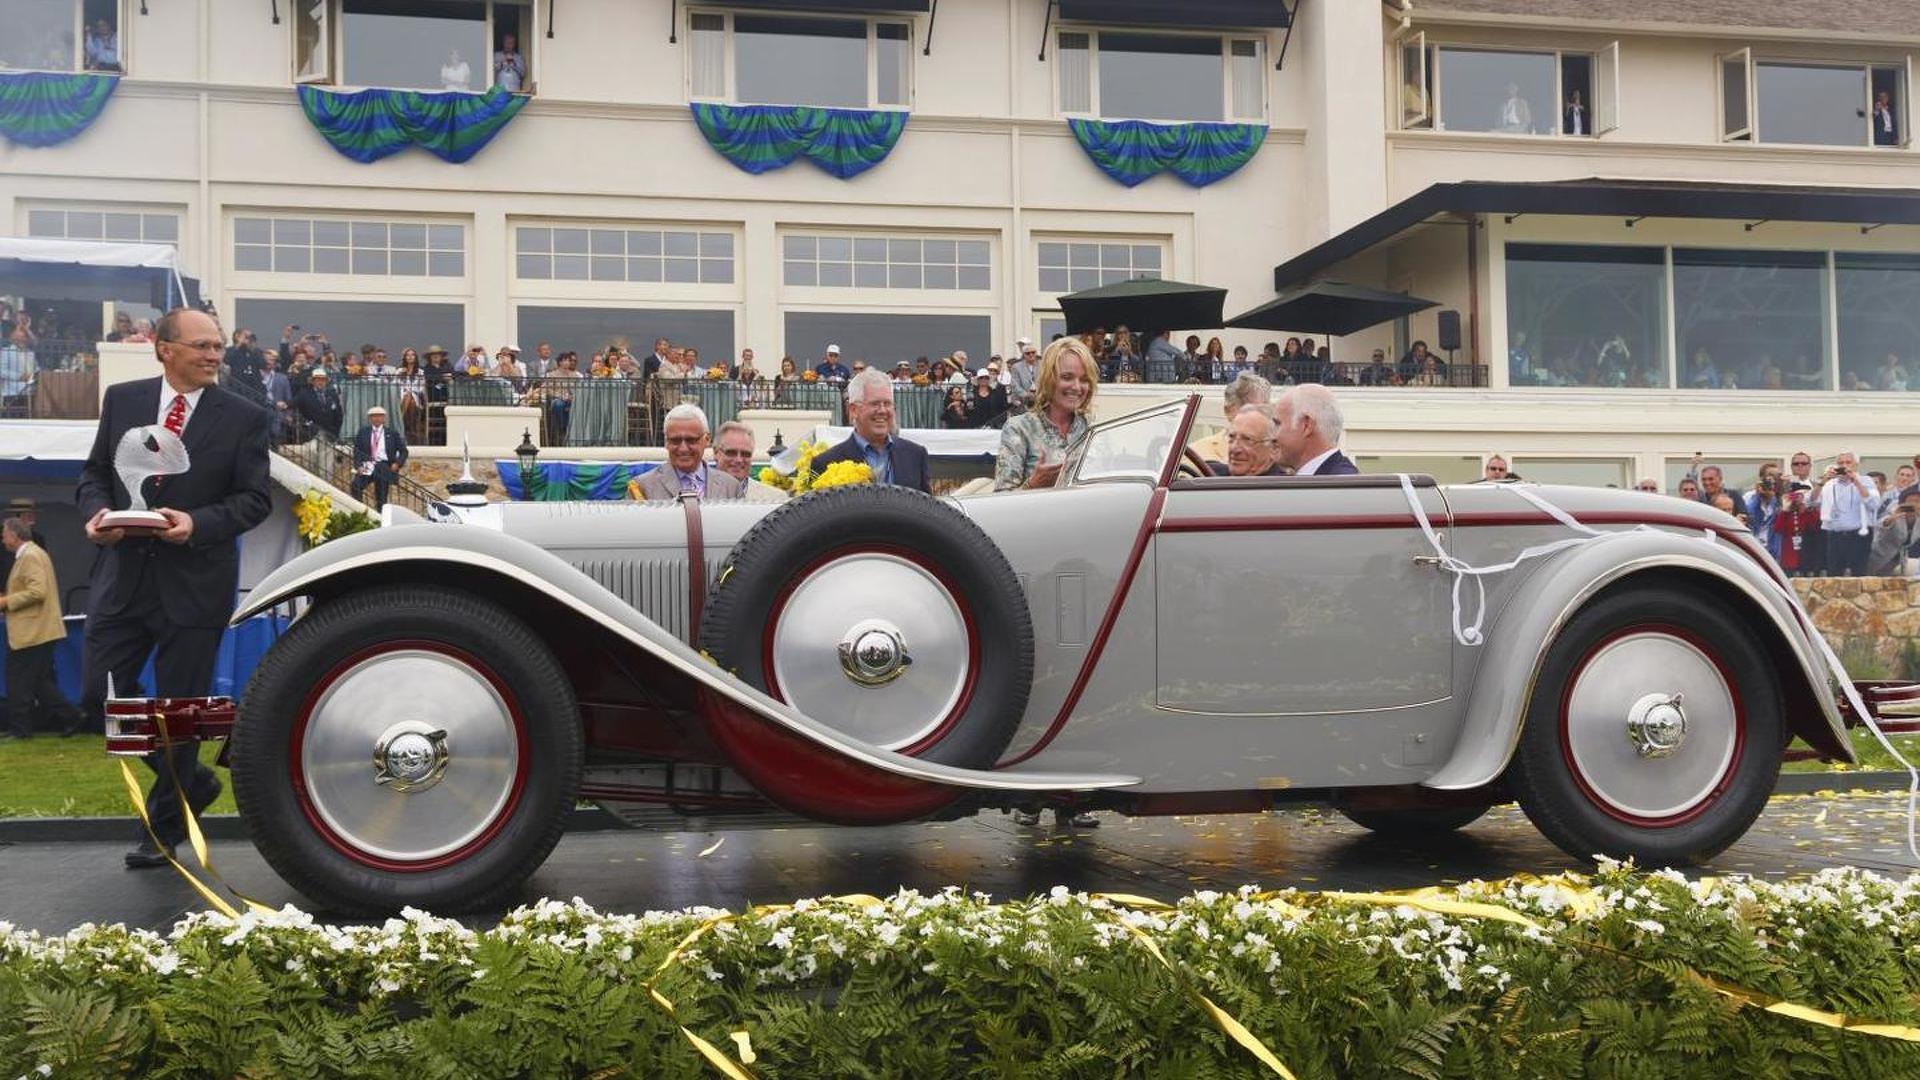 'Best in Show' award at Pebble Beach won by a 1928 Mercedes-Benz 680S Saoutchik Torpedo